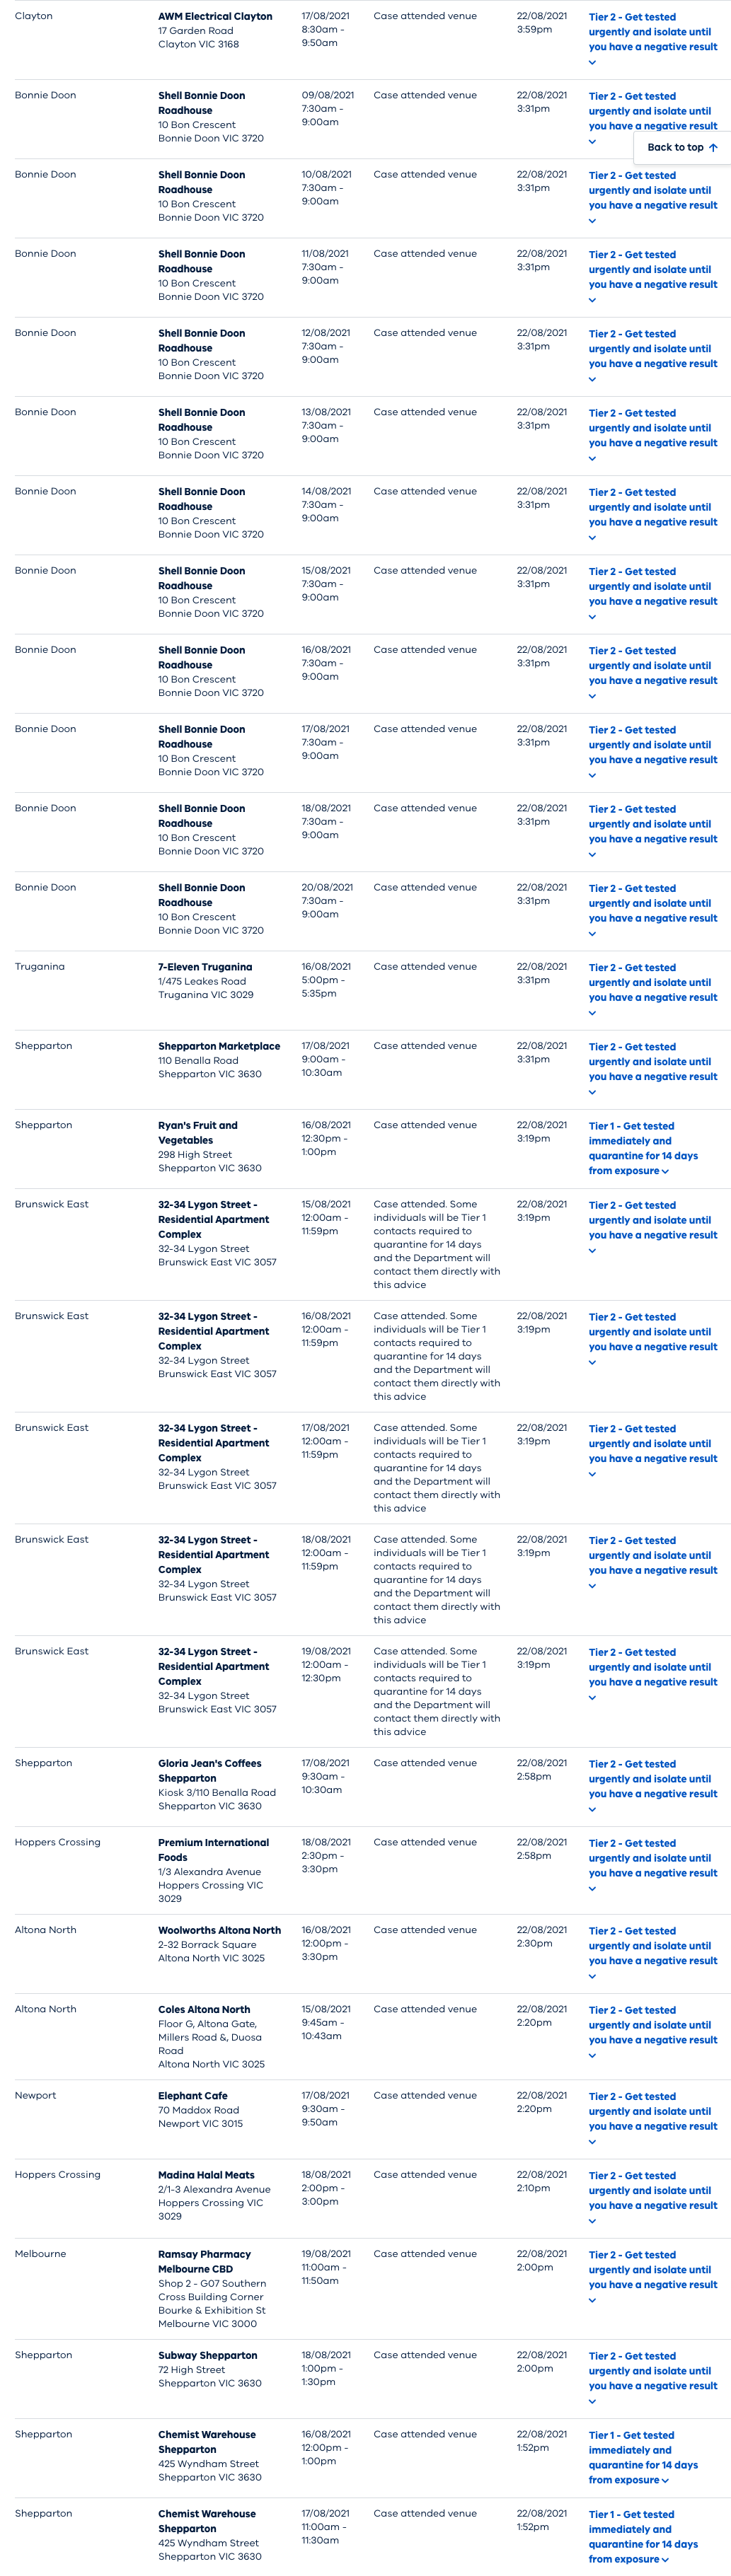 www.coronavirus.vic.gov.au_exposure-sites (33).png